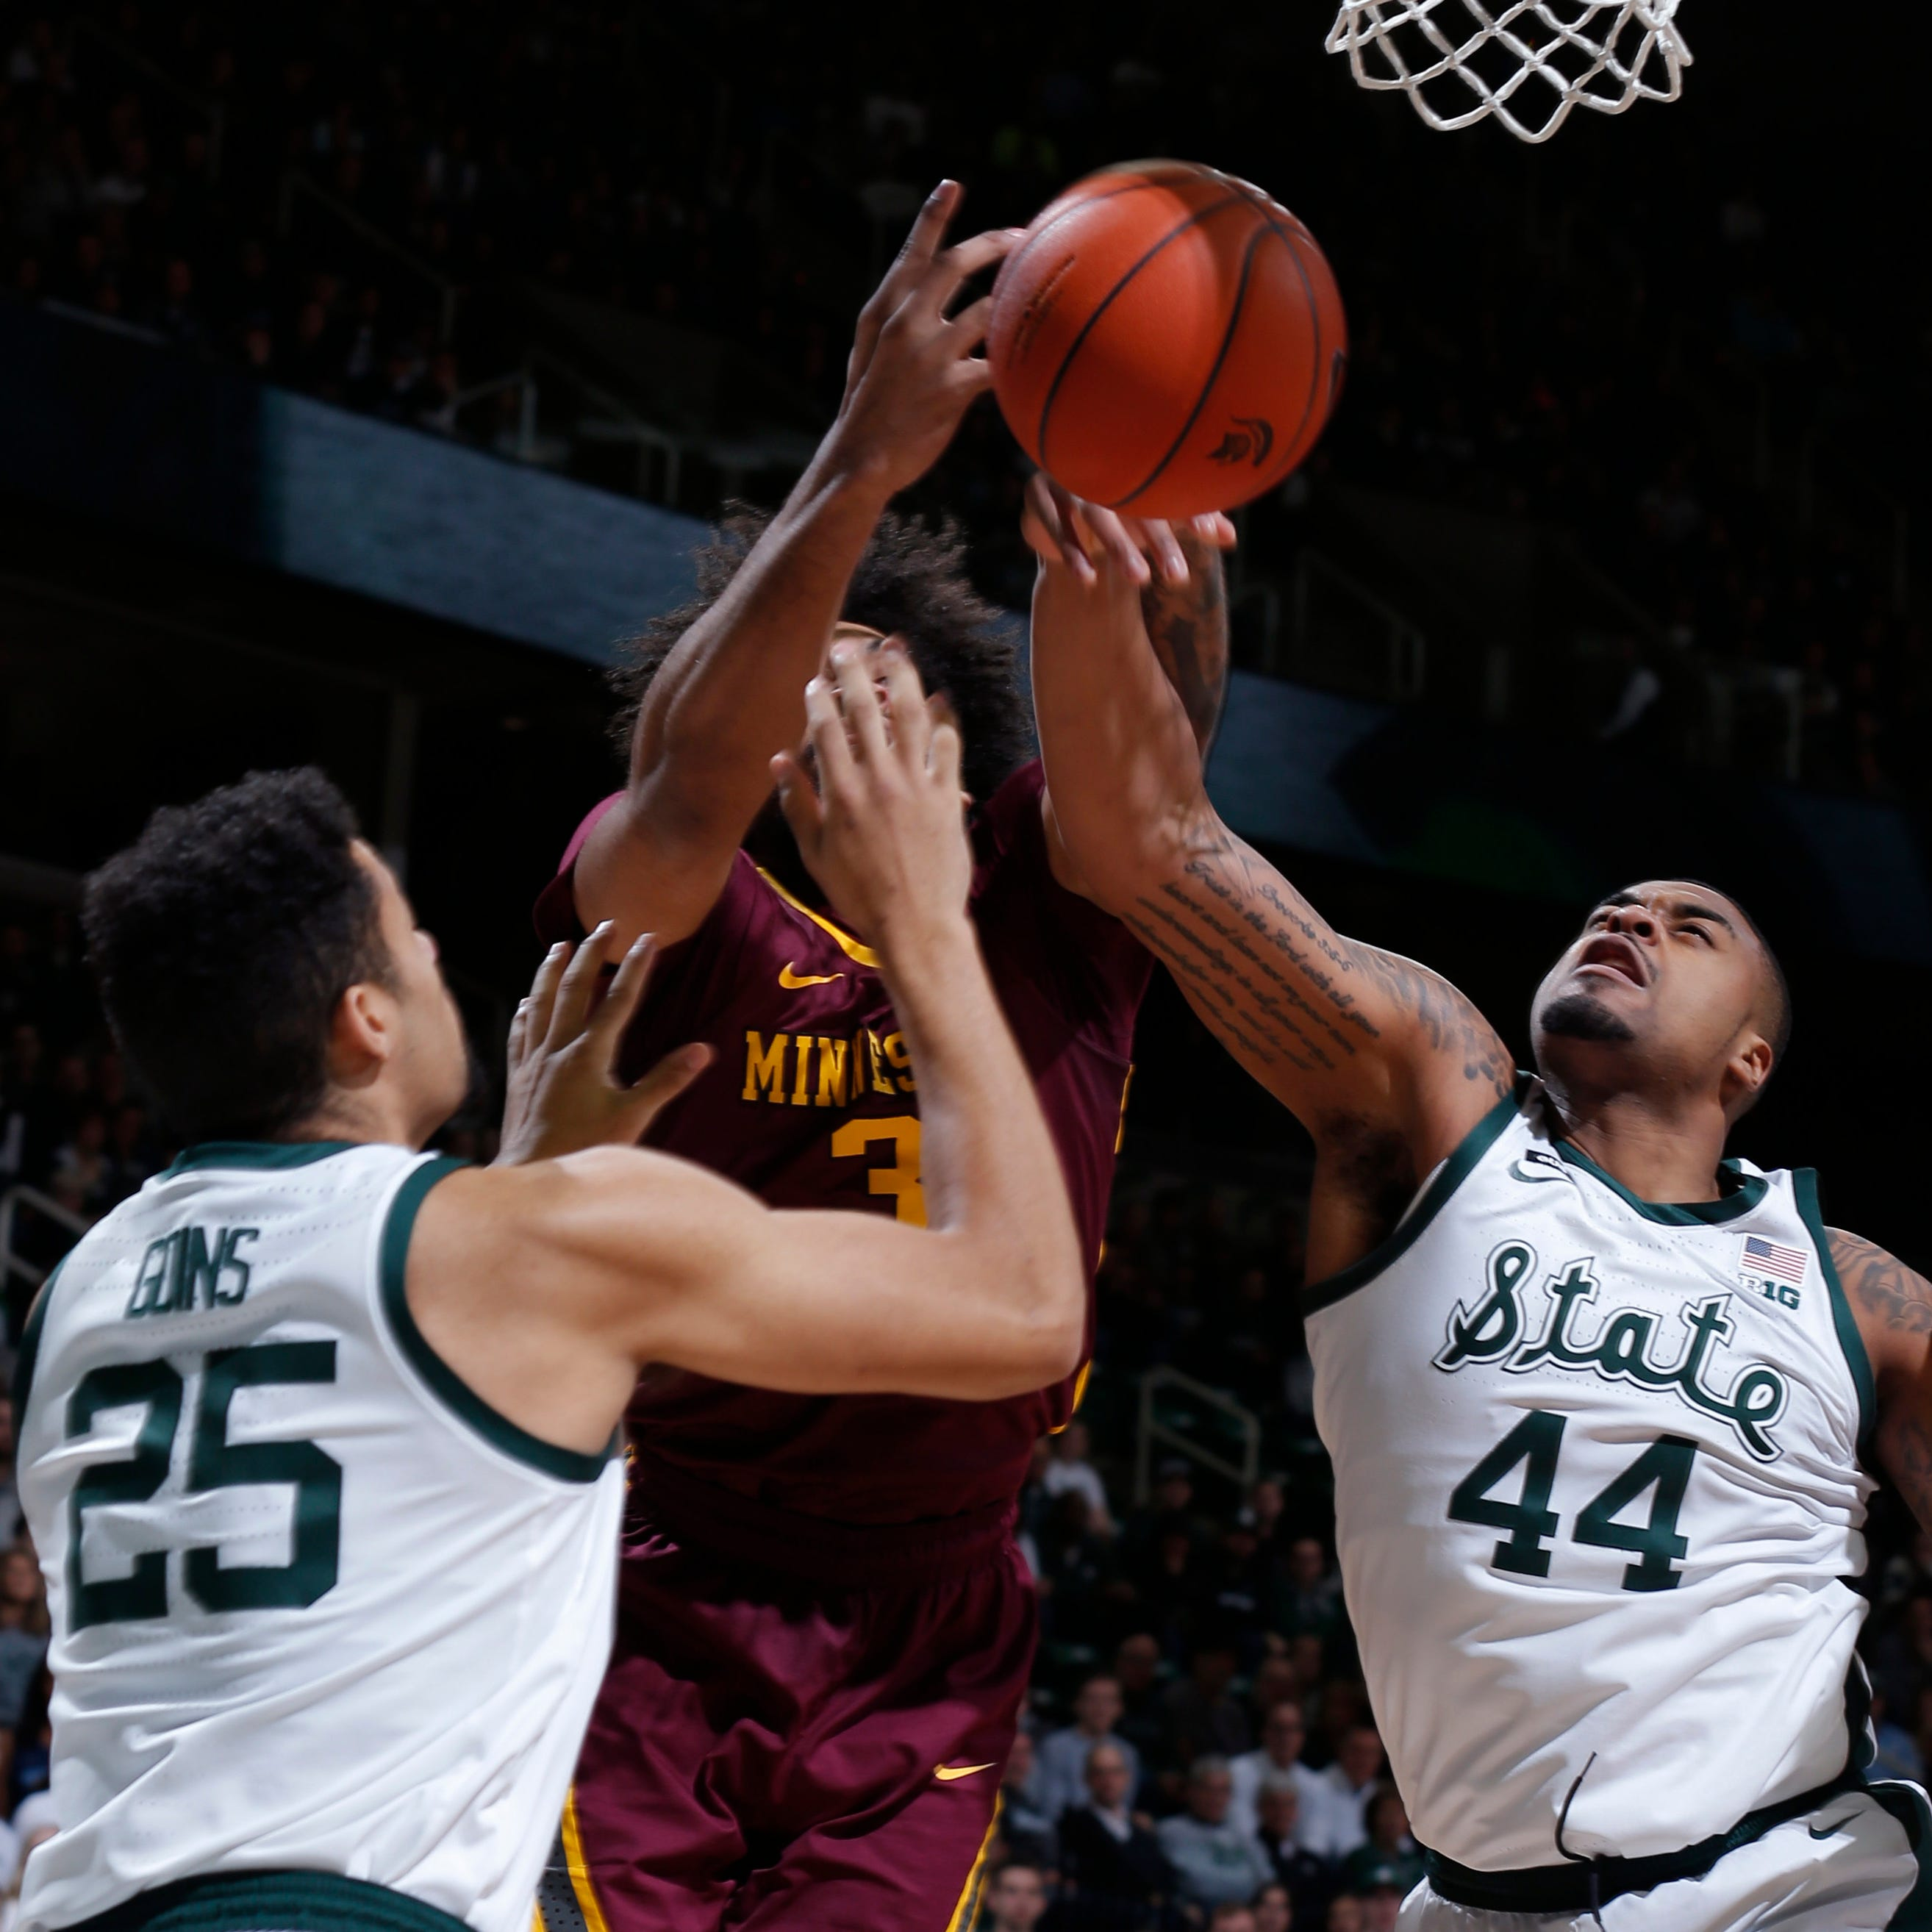 NCAA tournament 2nd-round predictions: Michigan, Michigan State advance